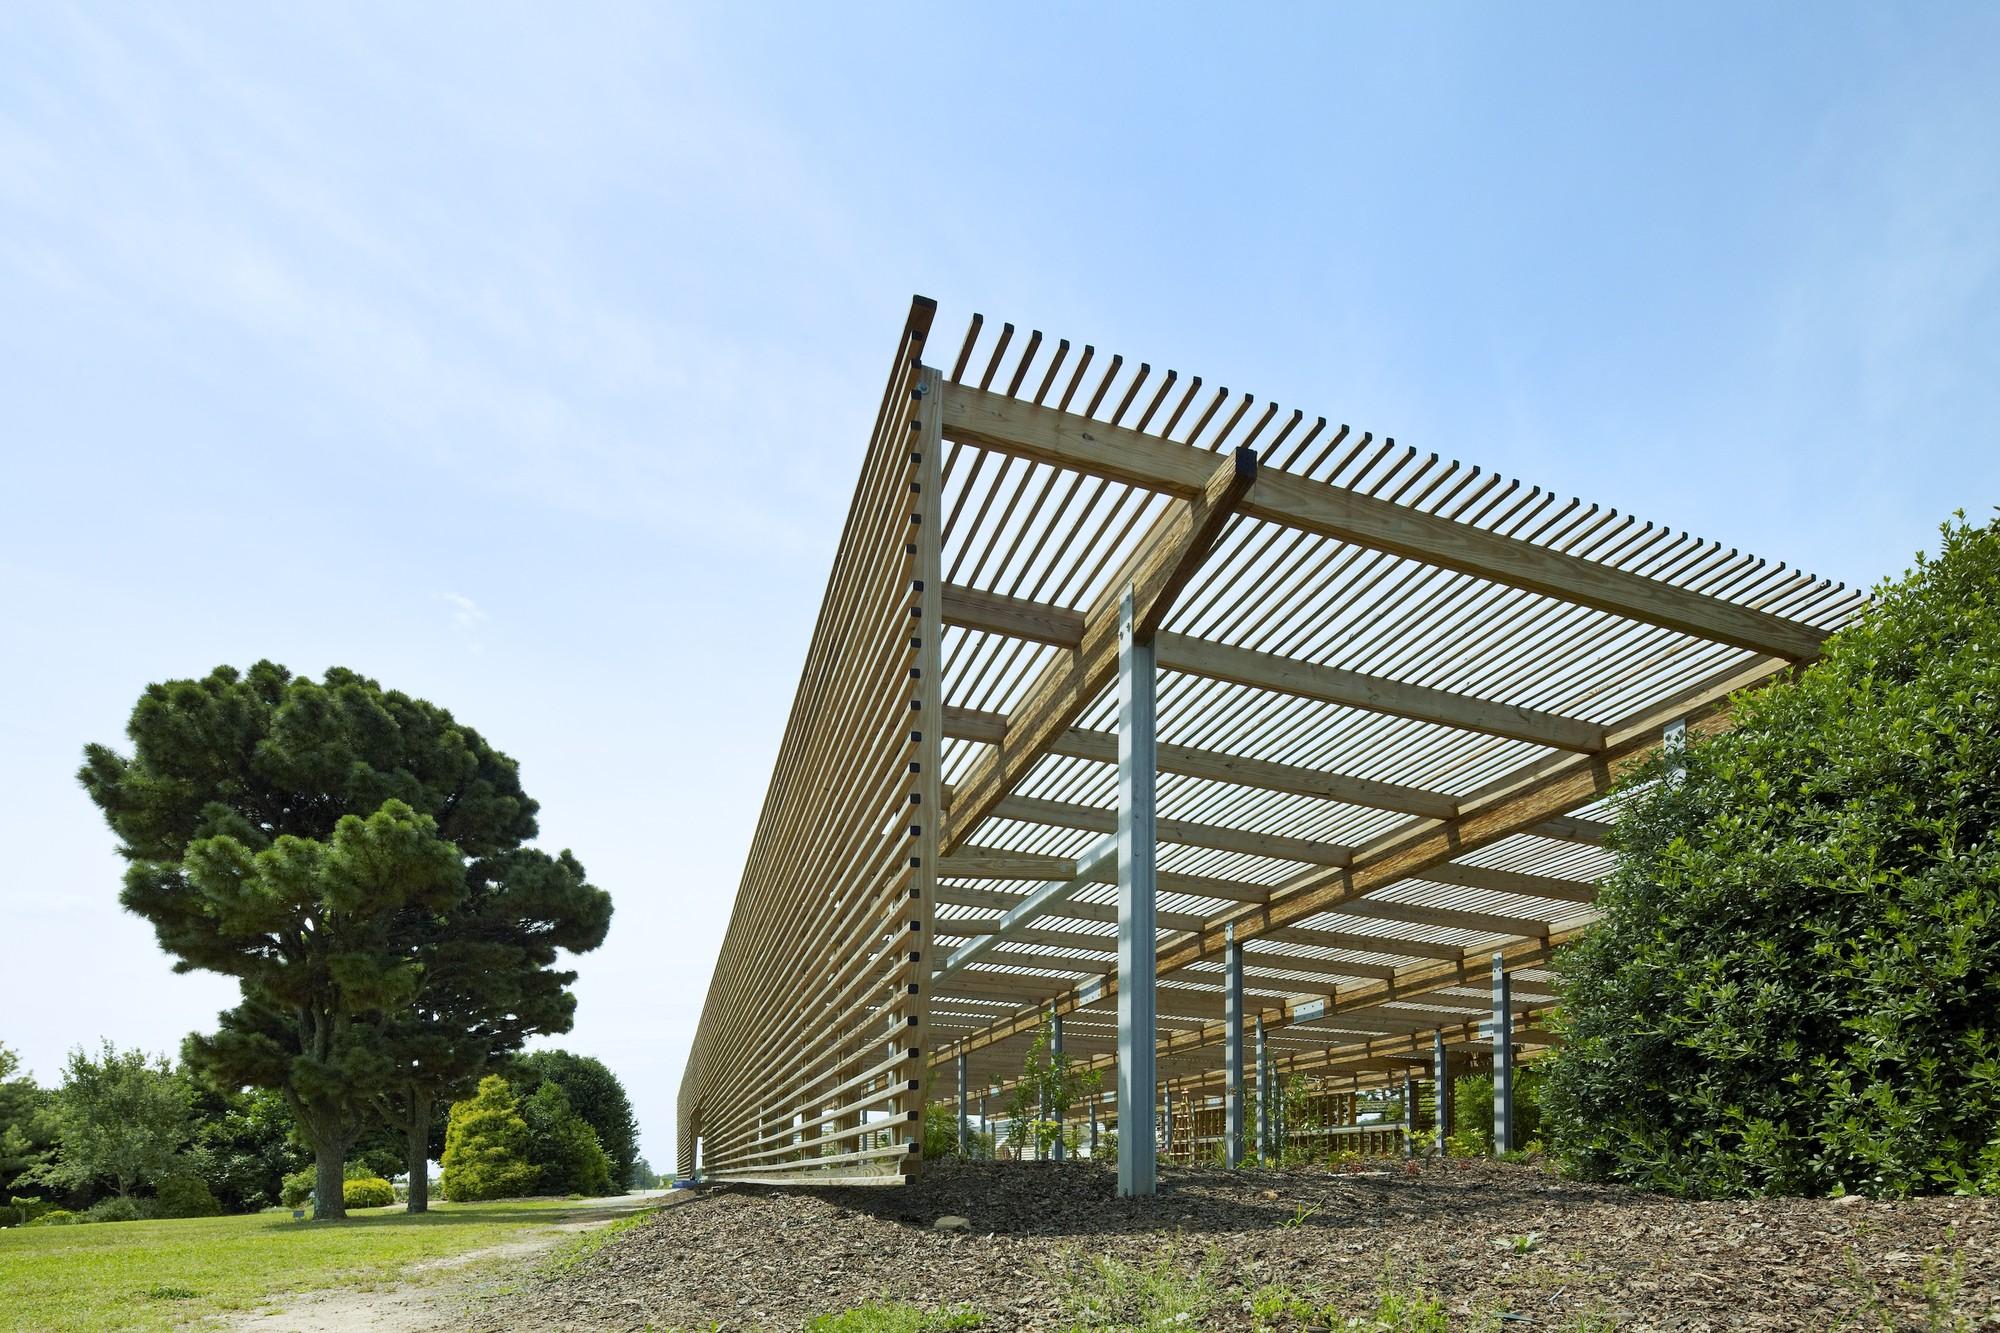 Jc Raulston Arboretum Lath House Frank Harmon Architect